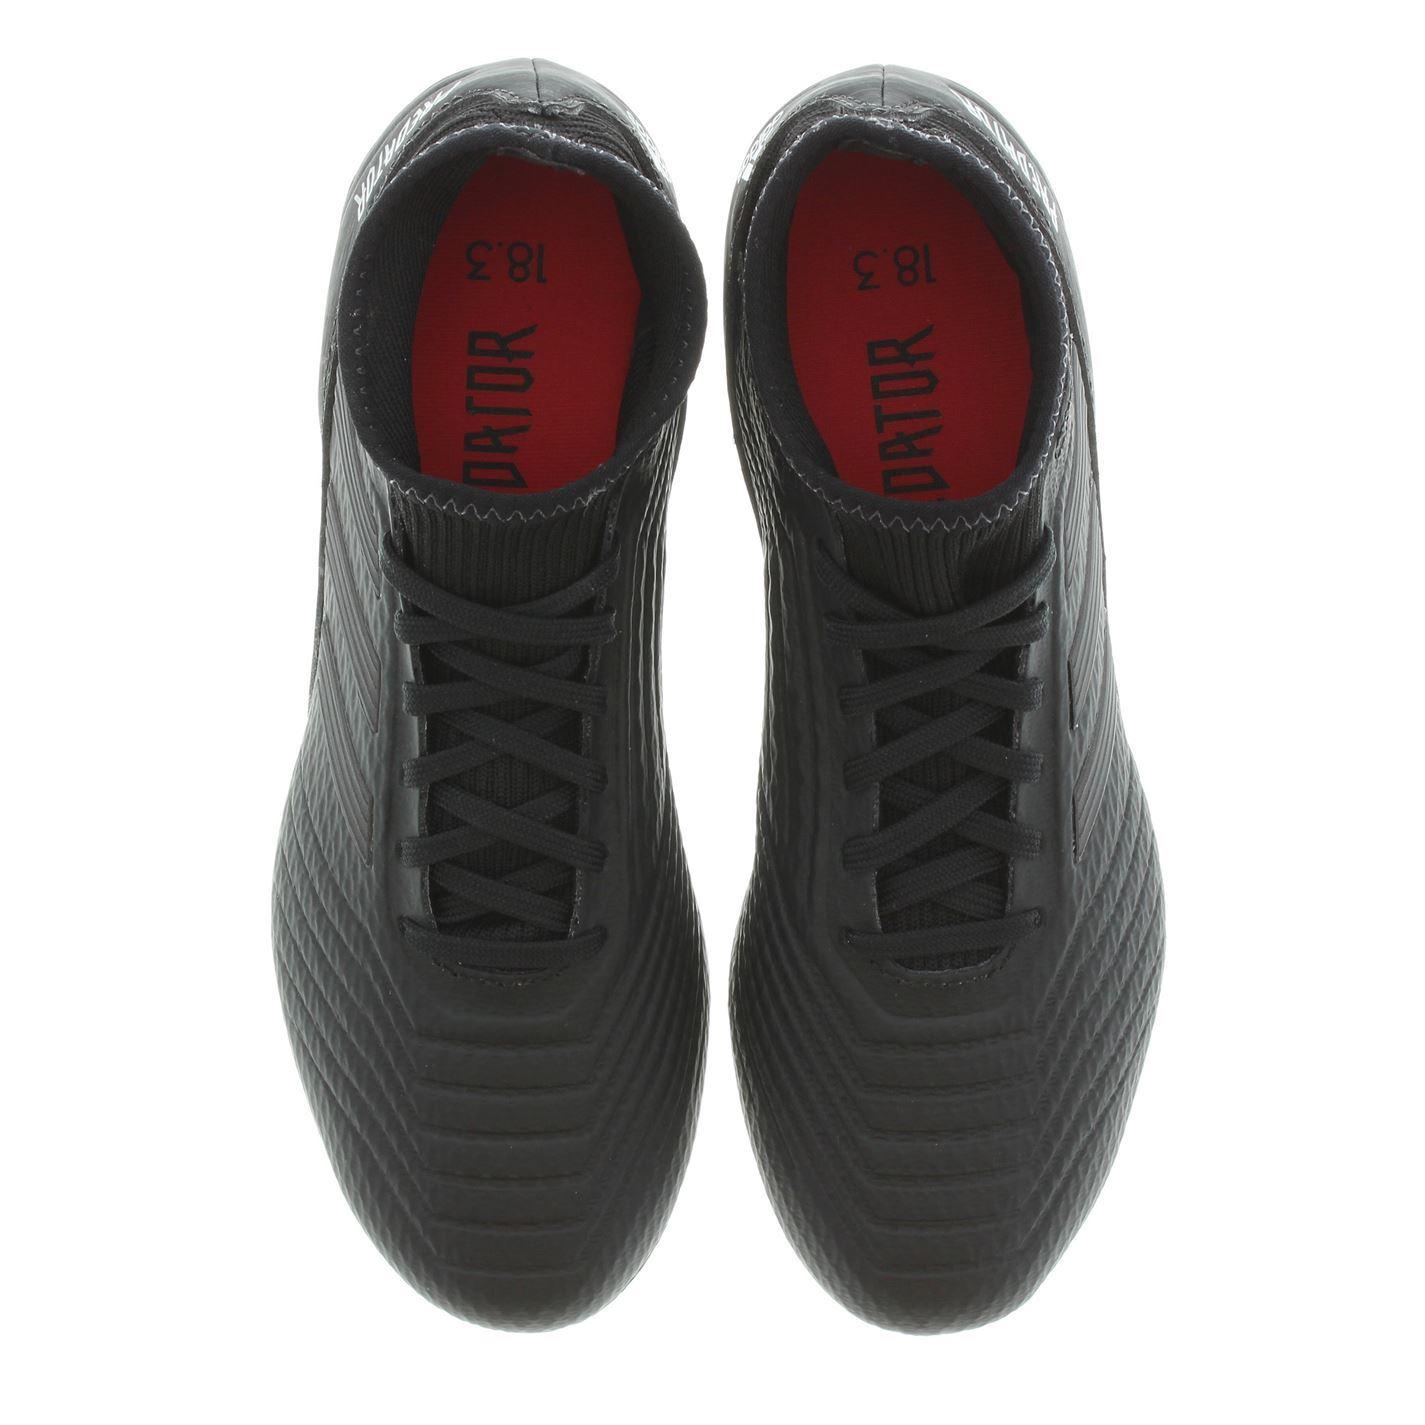 14c813cb9baa6 ... Adidas Predator 1 8.3 FG firma tierra fútbol botas Juniors negro futbol  tacos